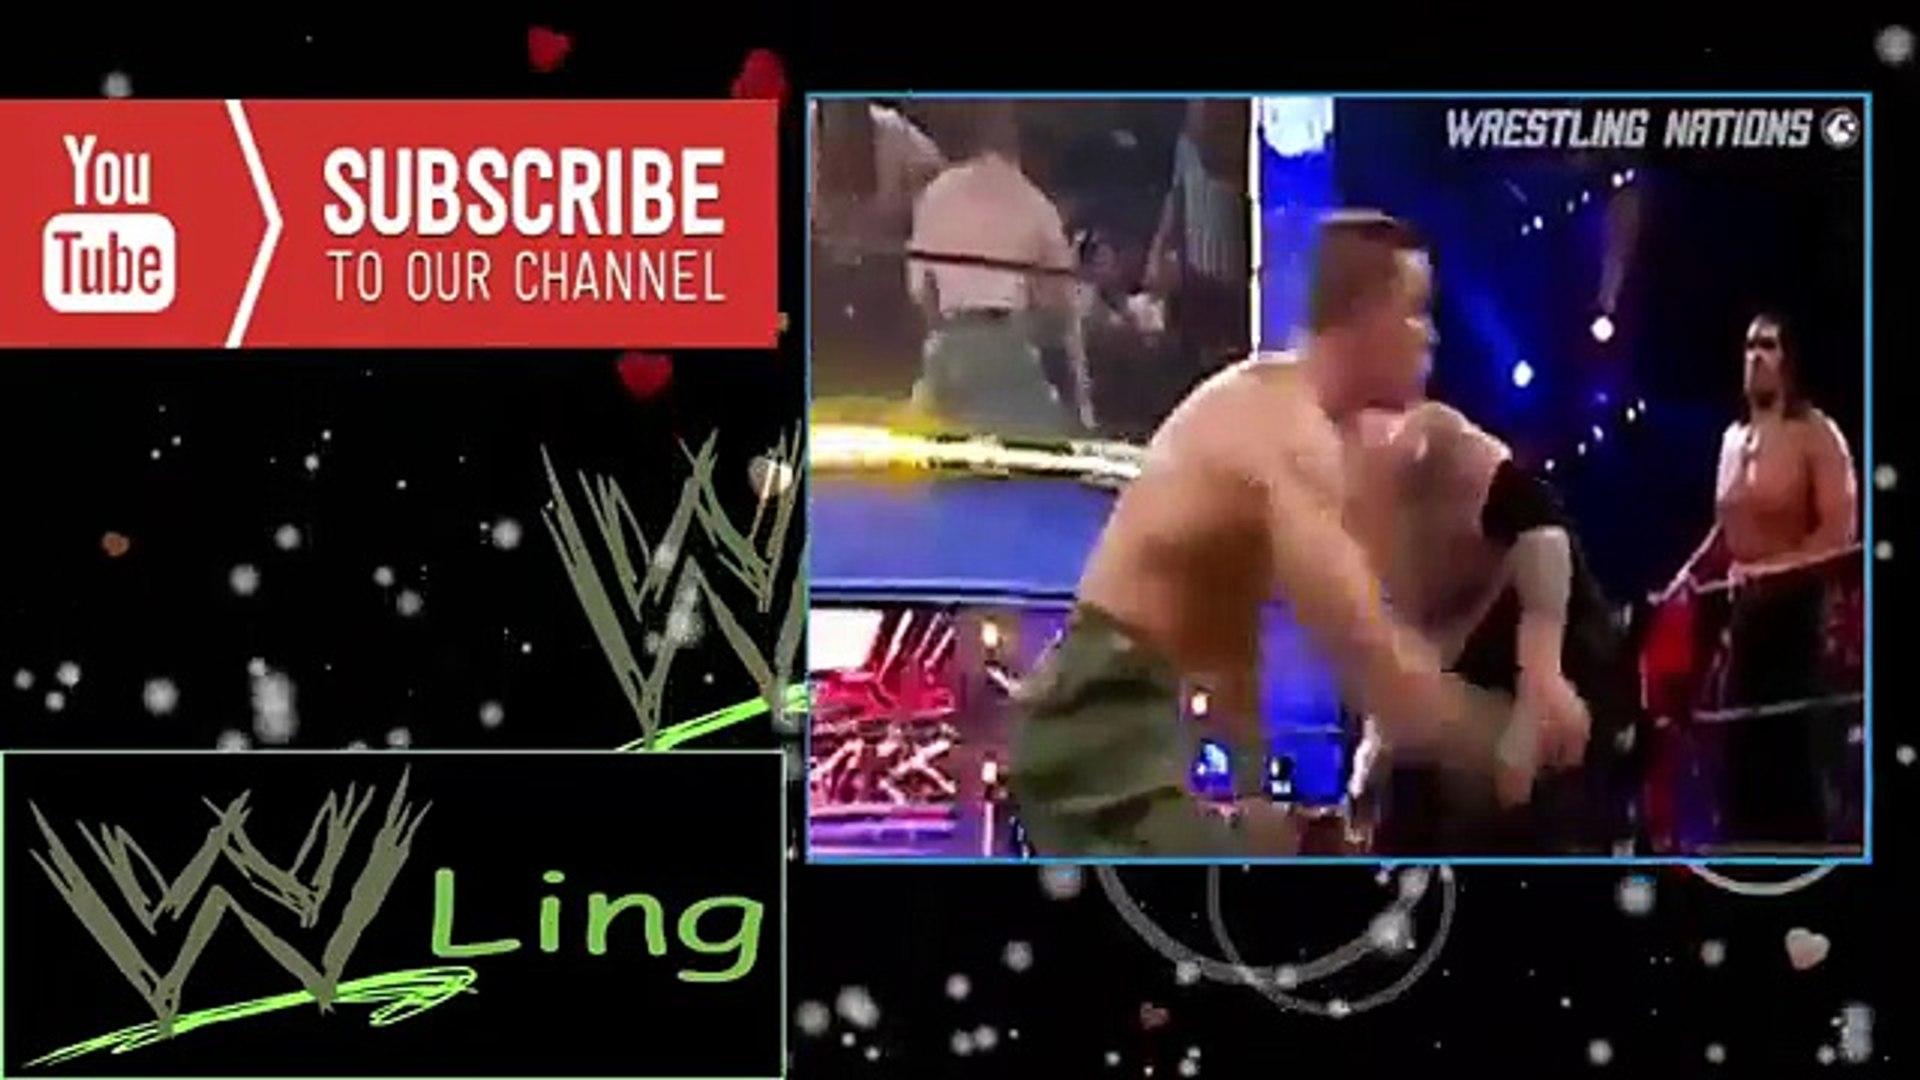 WWE John Cena and Boby Lashley vs WWE Great Khali, Umaga and Shane Mcmahon - WWE Raw 2007 Full